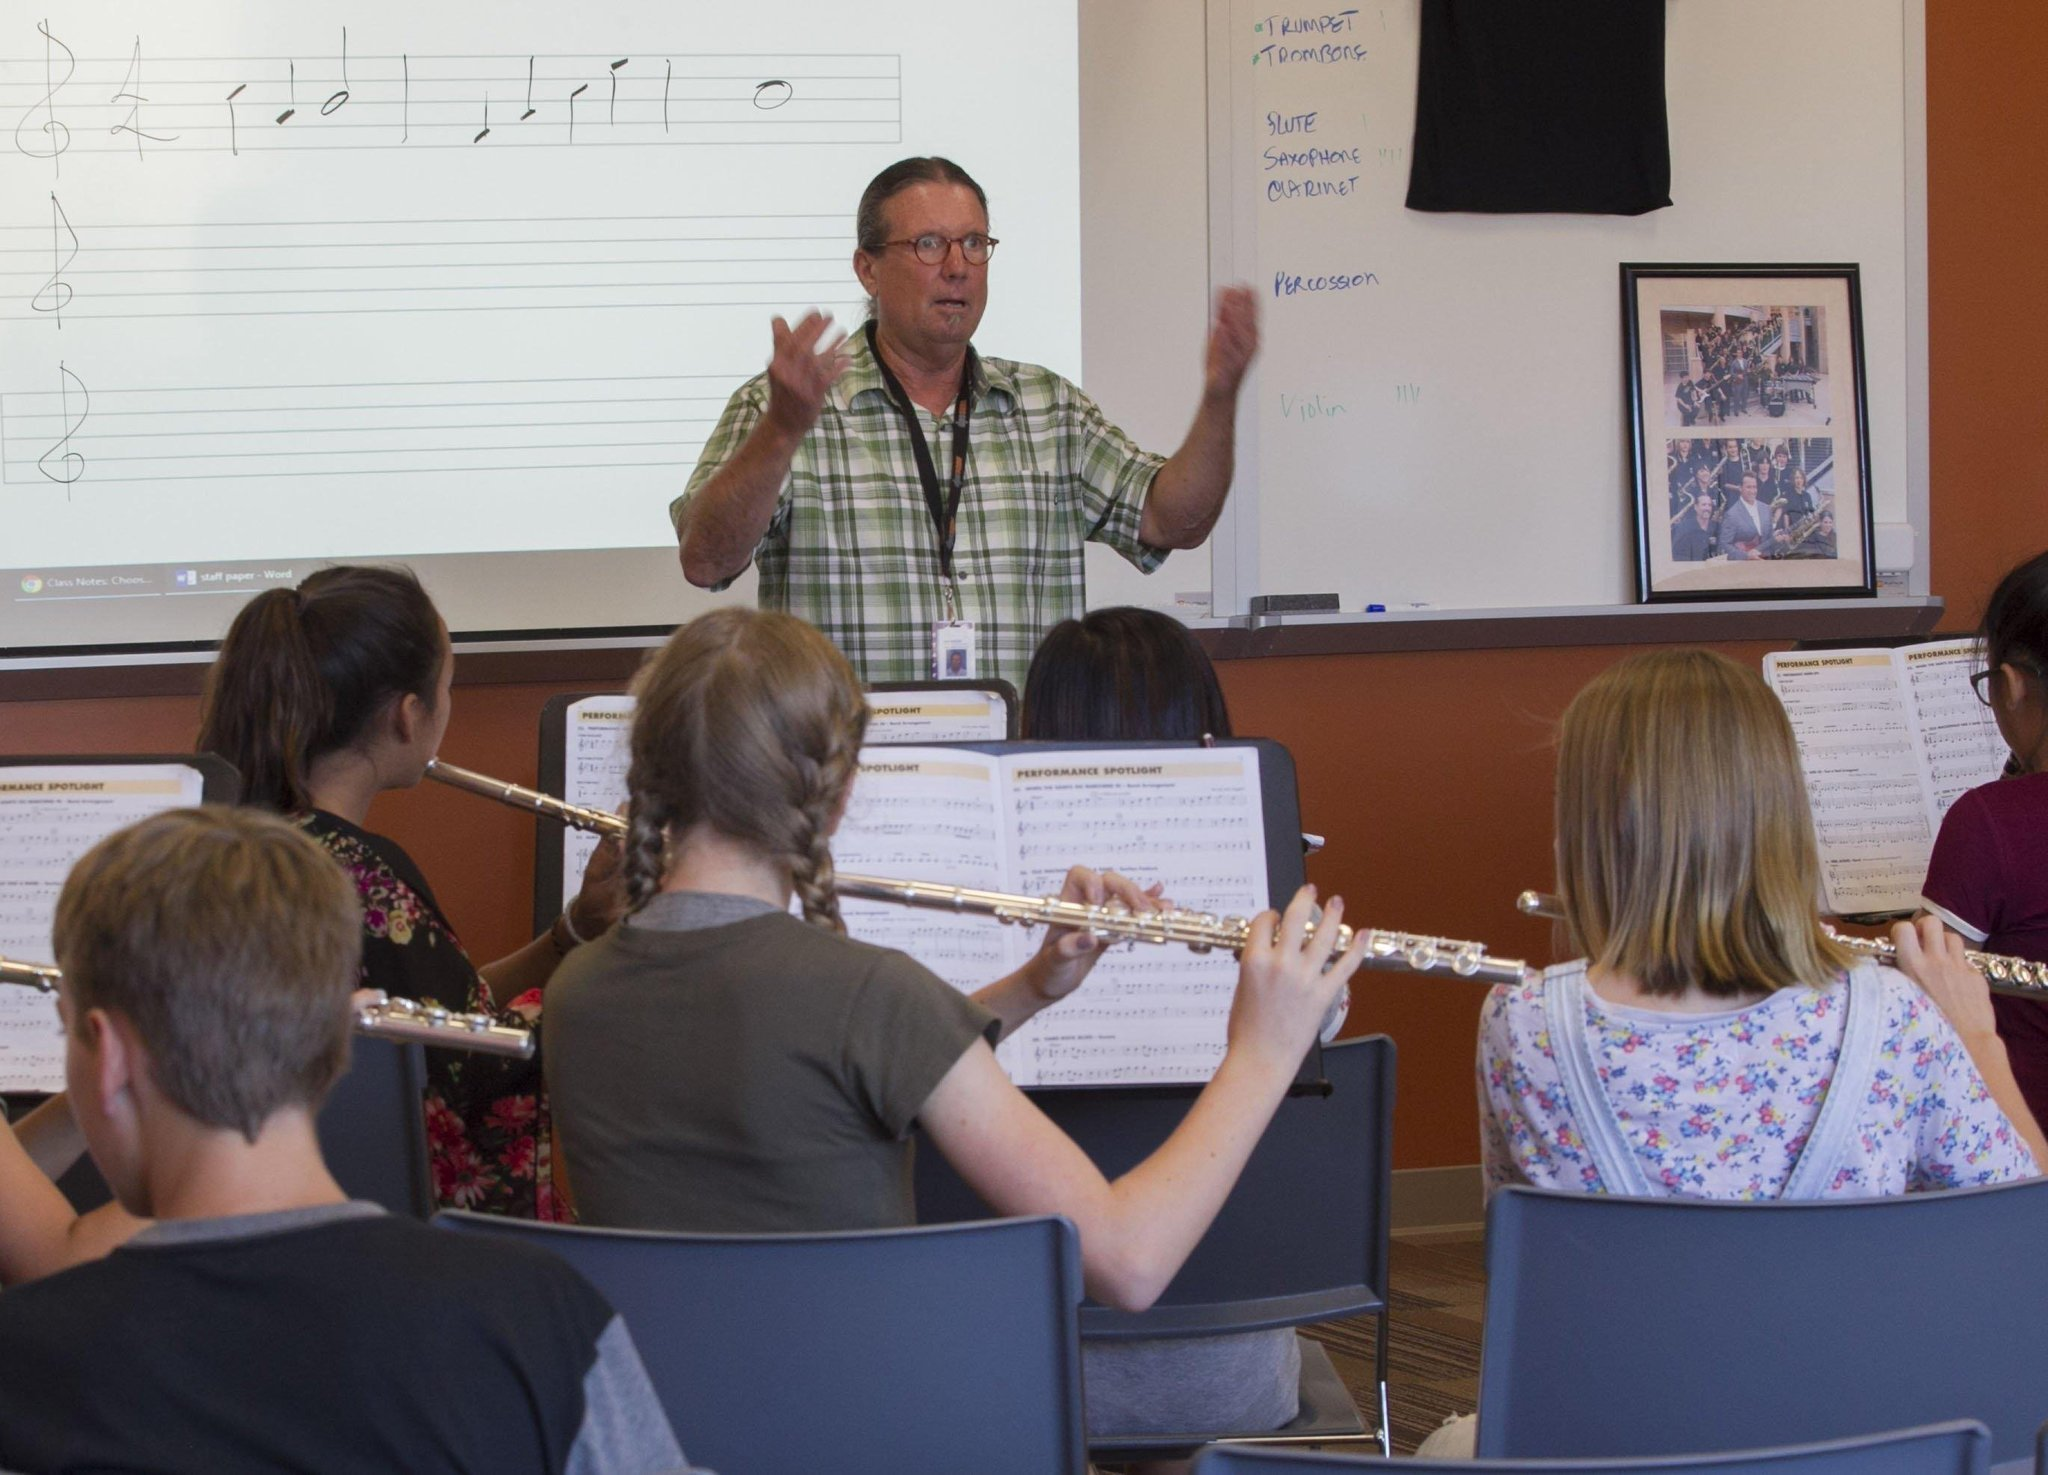 Double Peak School In San Marcos Focuses On Innovation